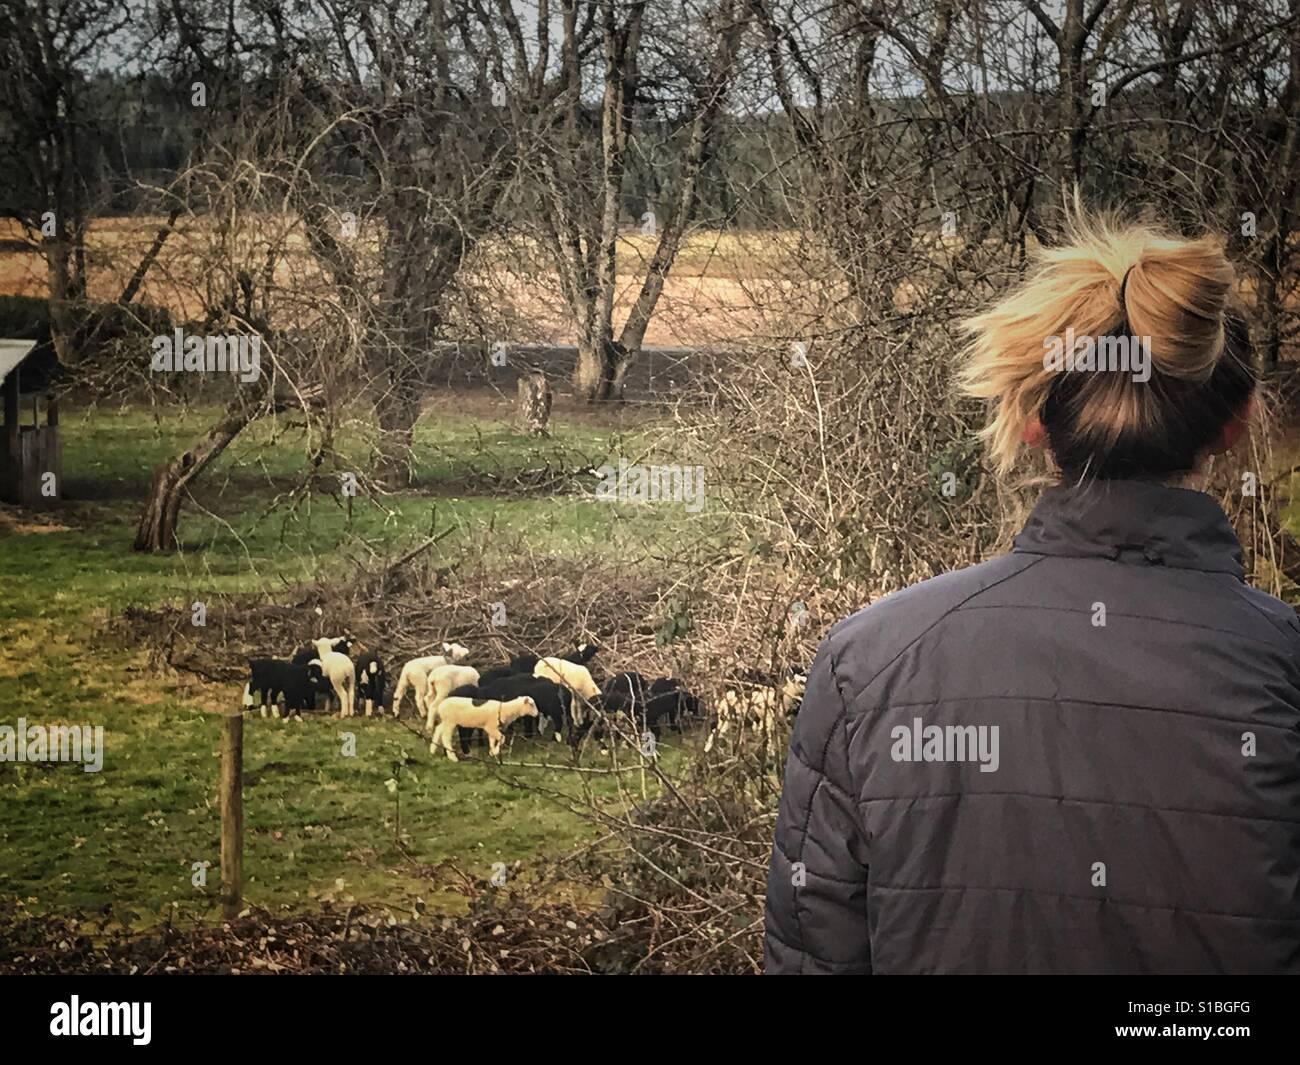 Lambs - Stock Image